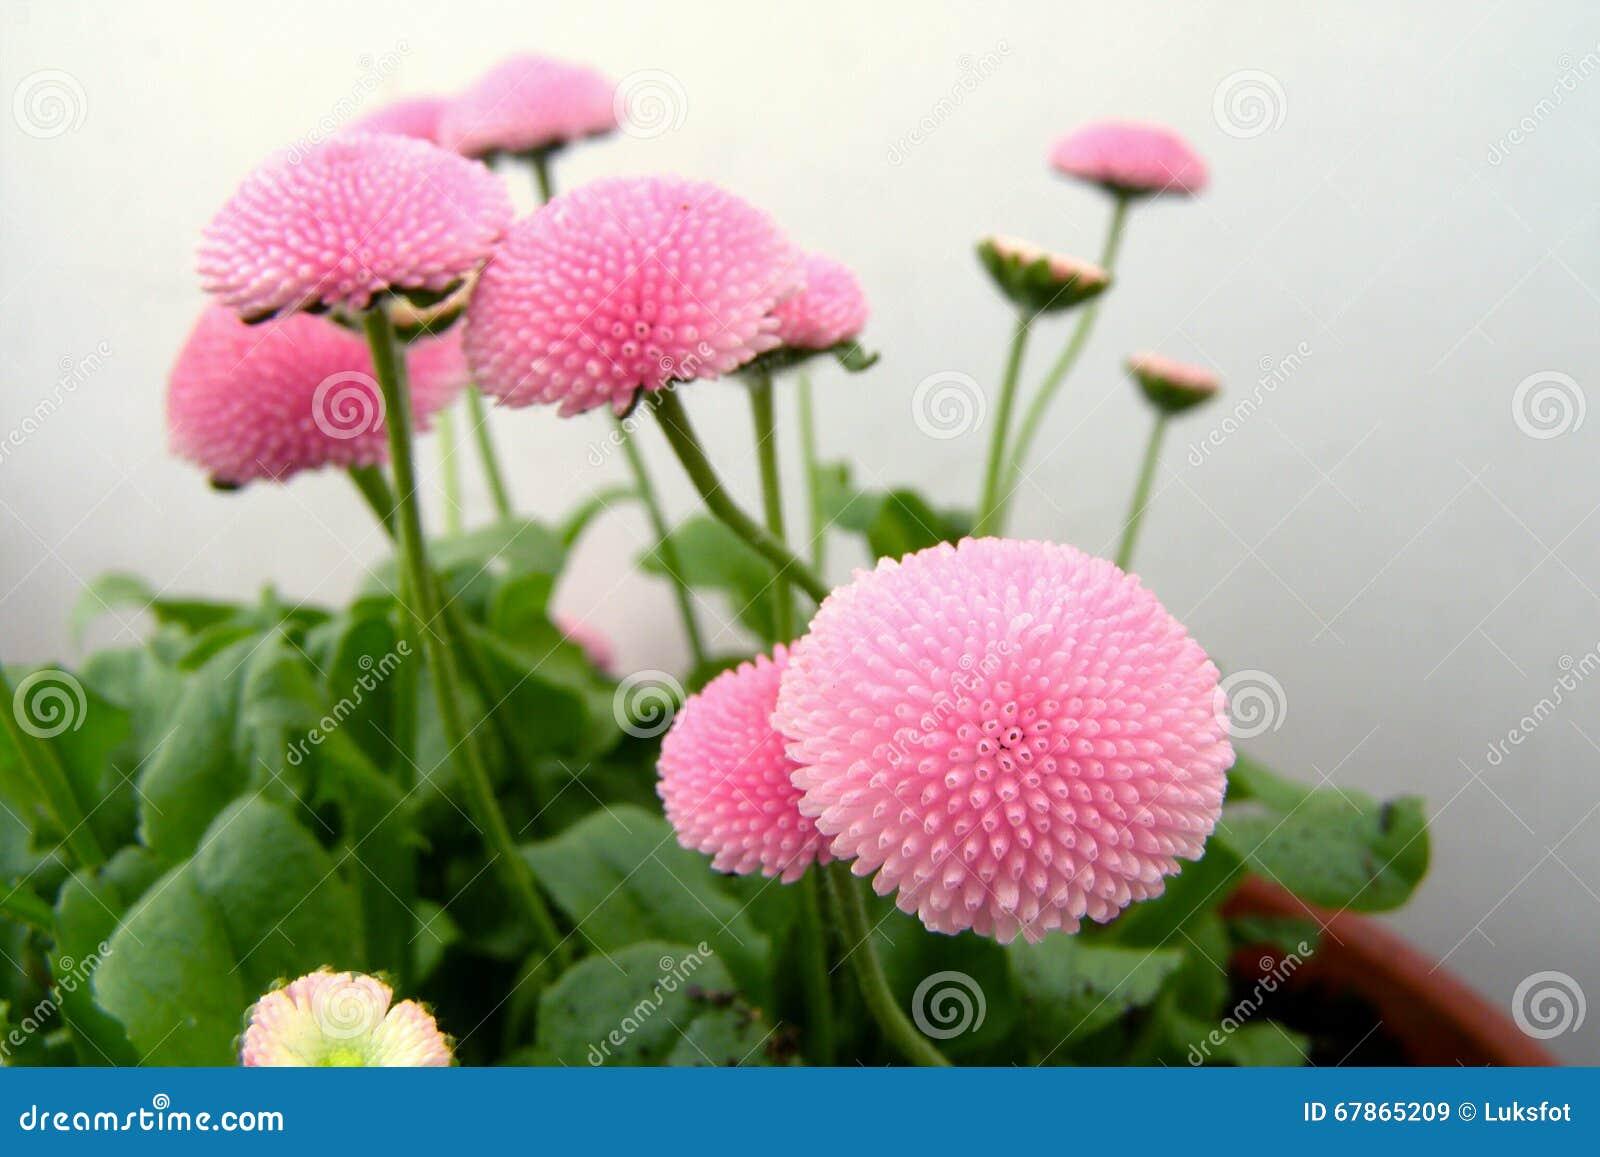 Pink english daisy flowers blossom stock image image of green pink english daisy flowers blossom izmirmasajfo